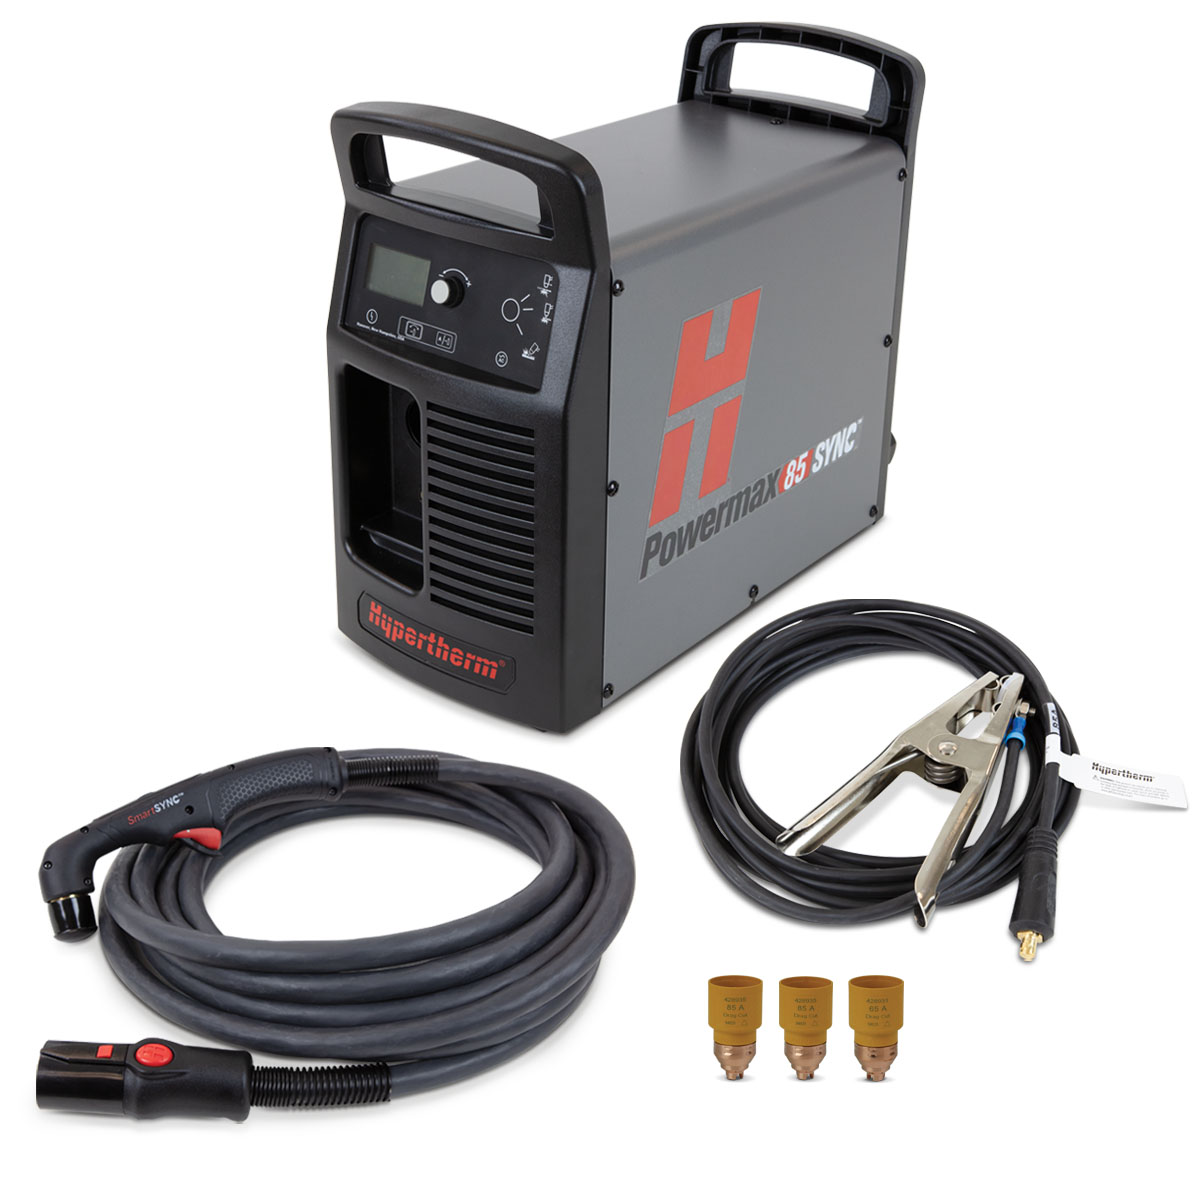 Hypertherm Powermax85 SYNC 415V Package